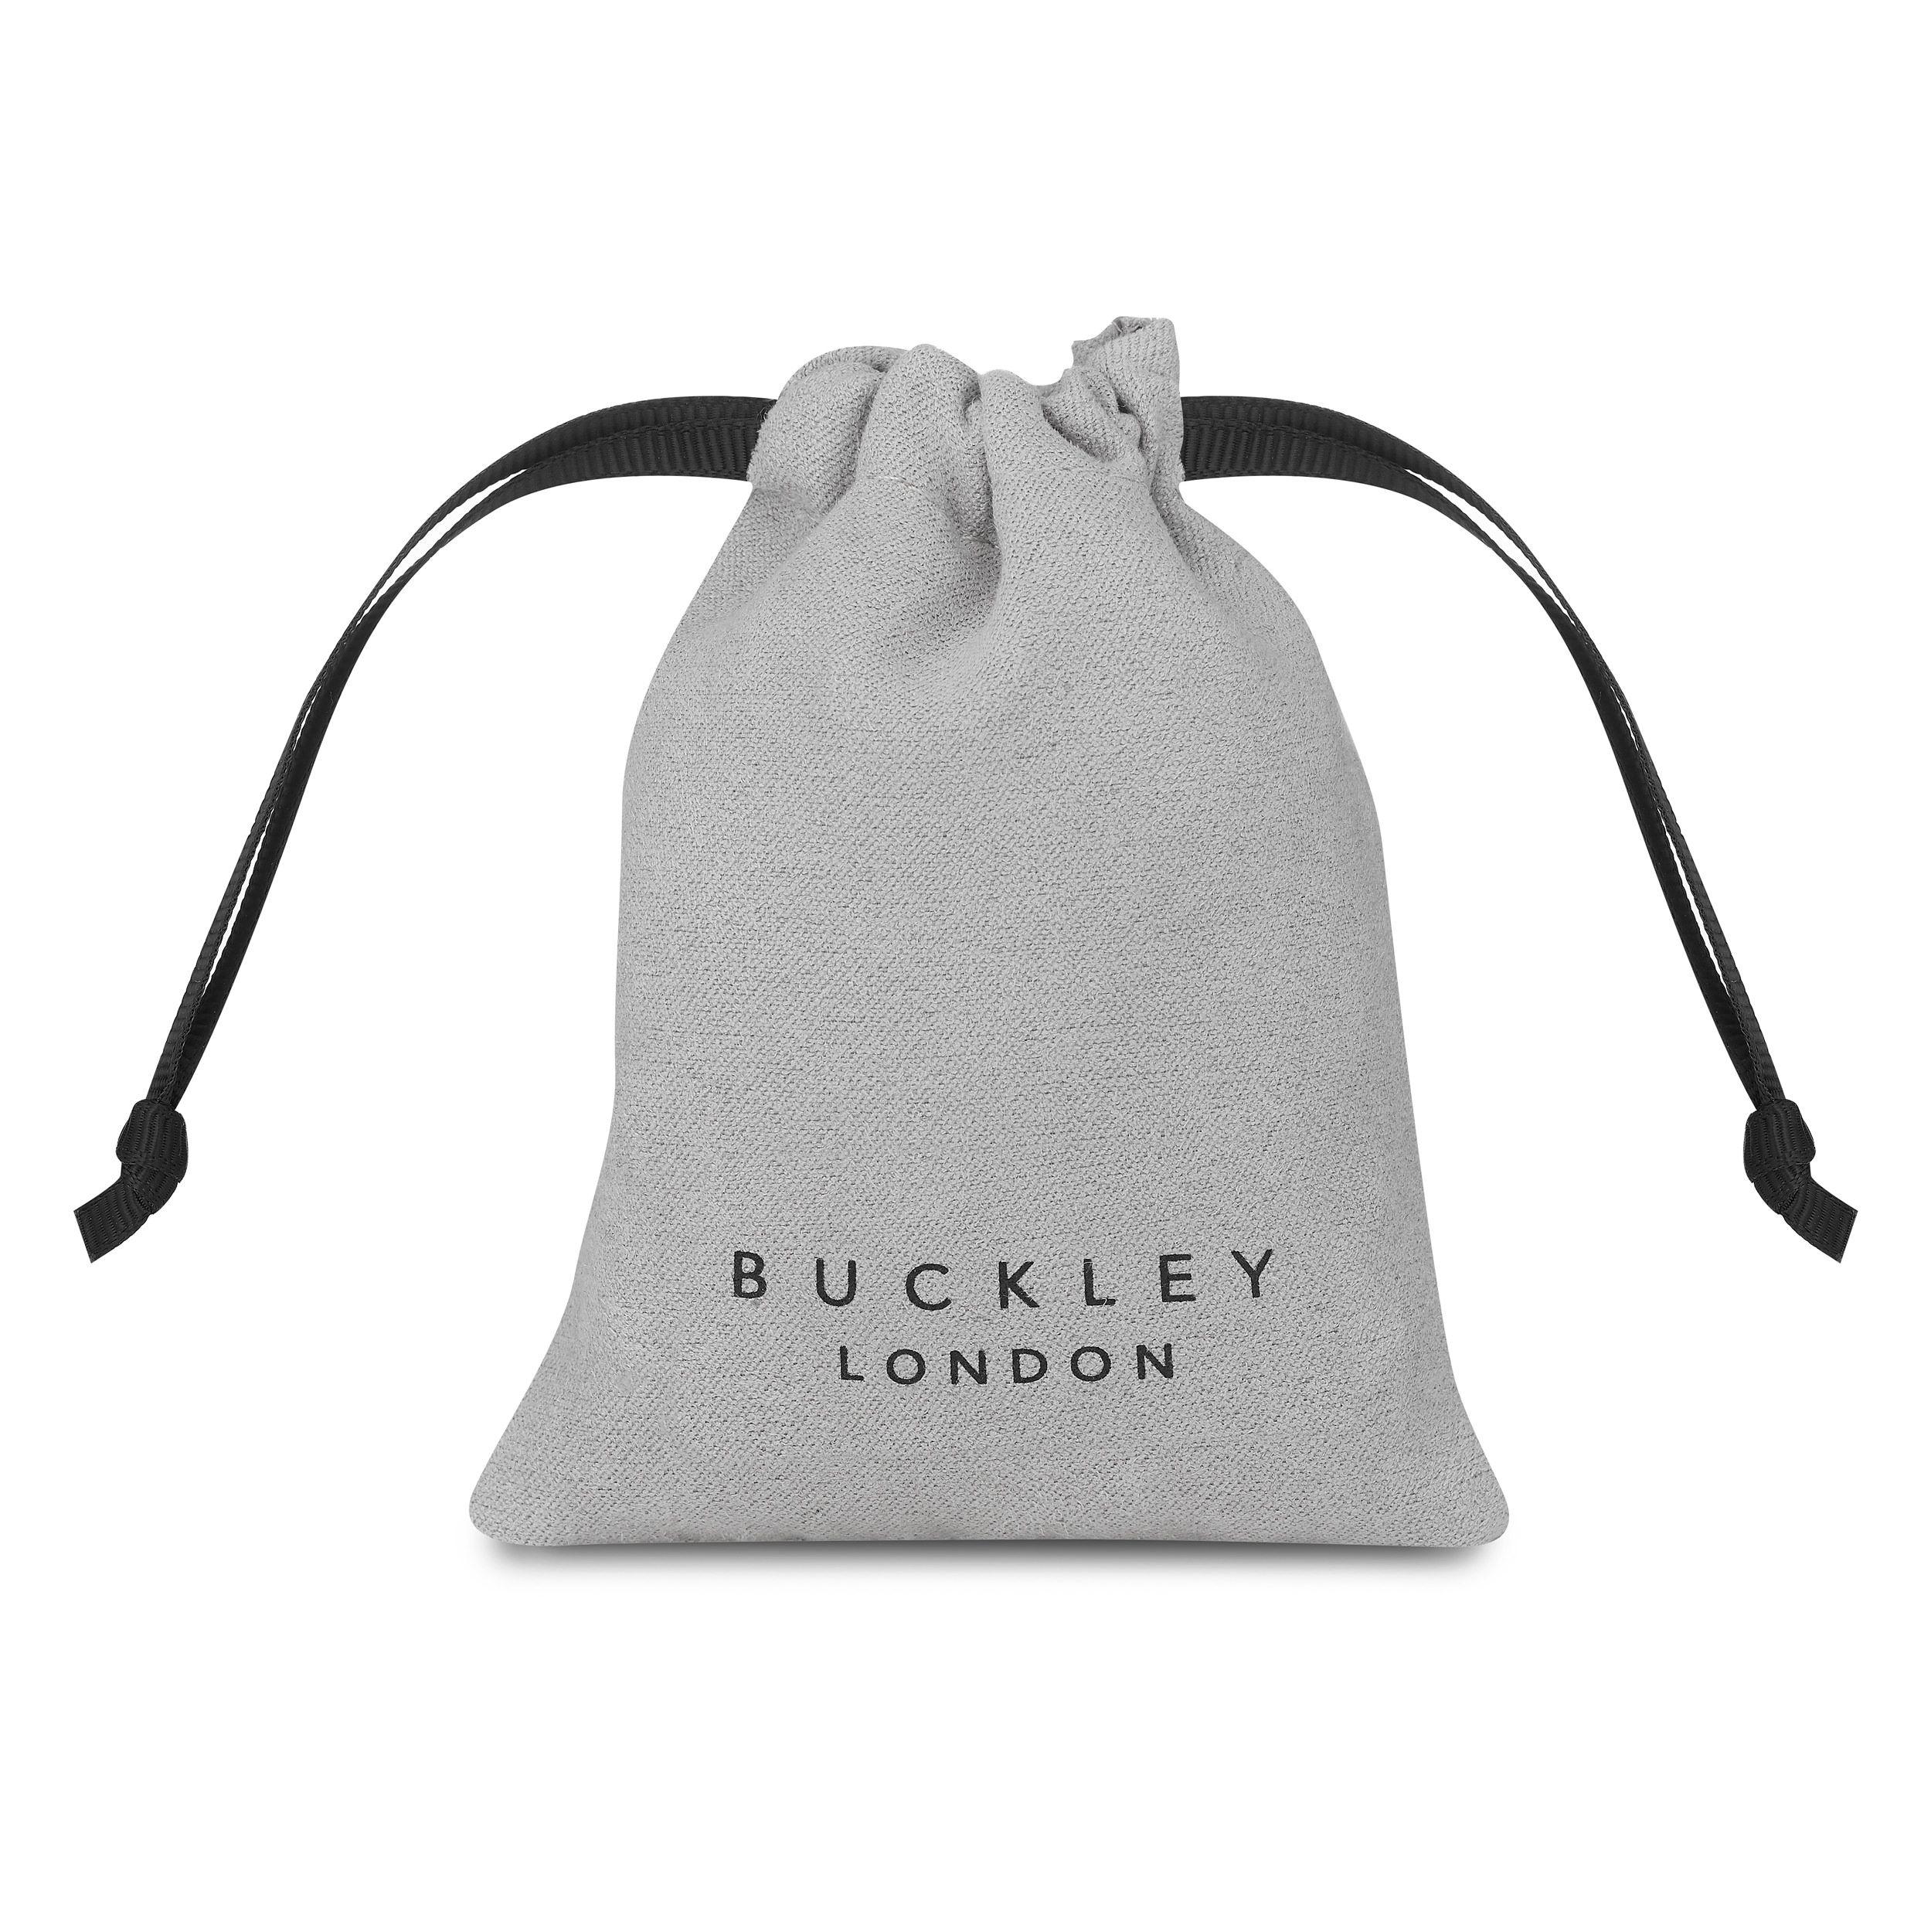 Buckley London Hugs & Kisses 'X' Bracelet - Gold Bag